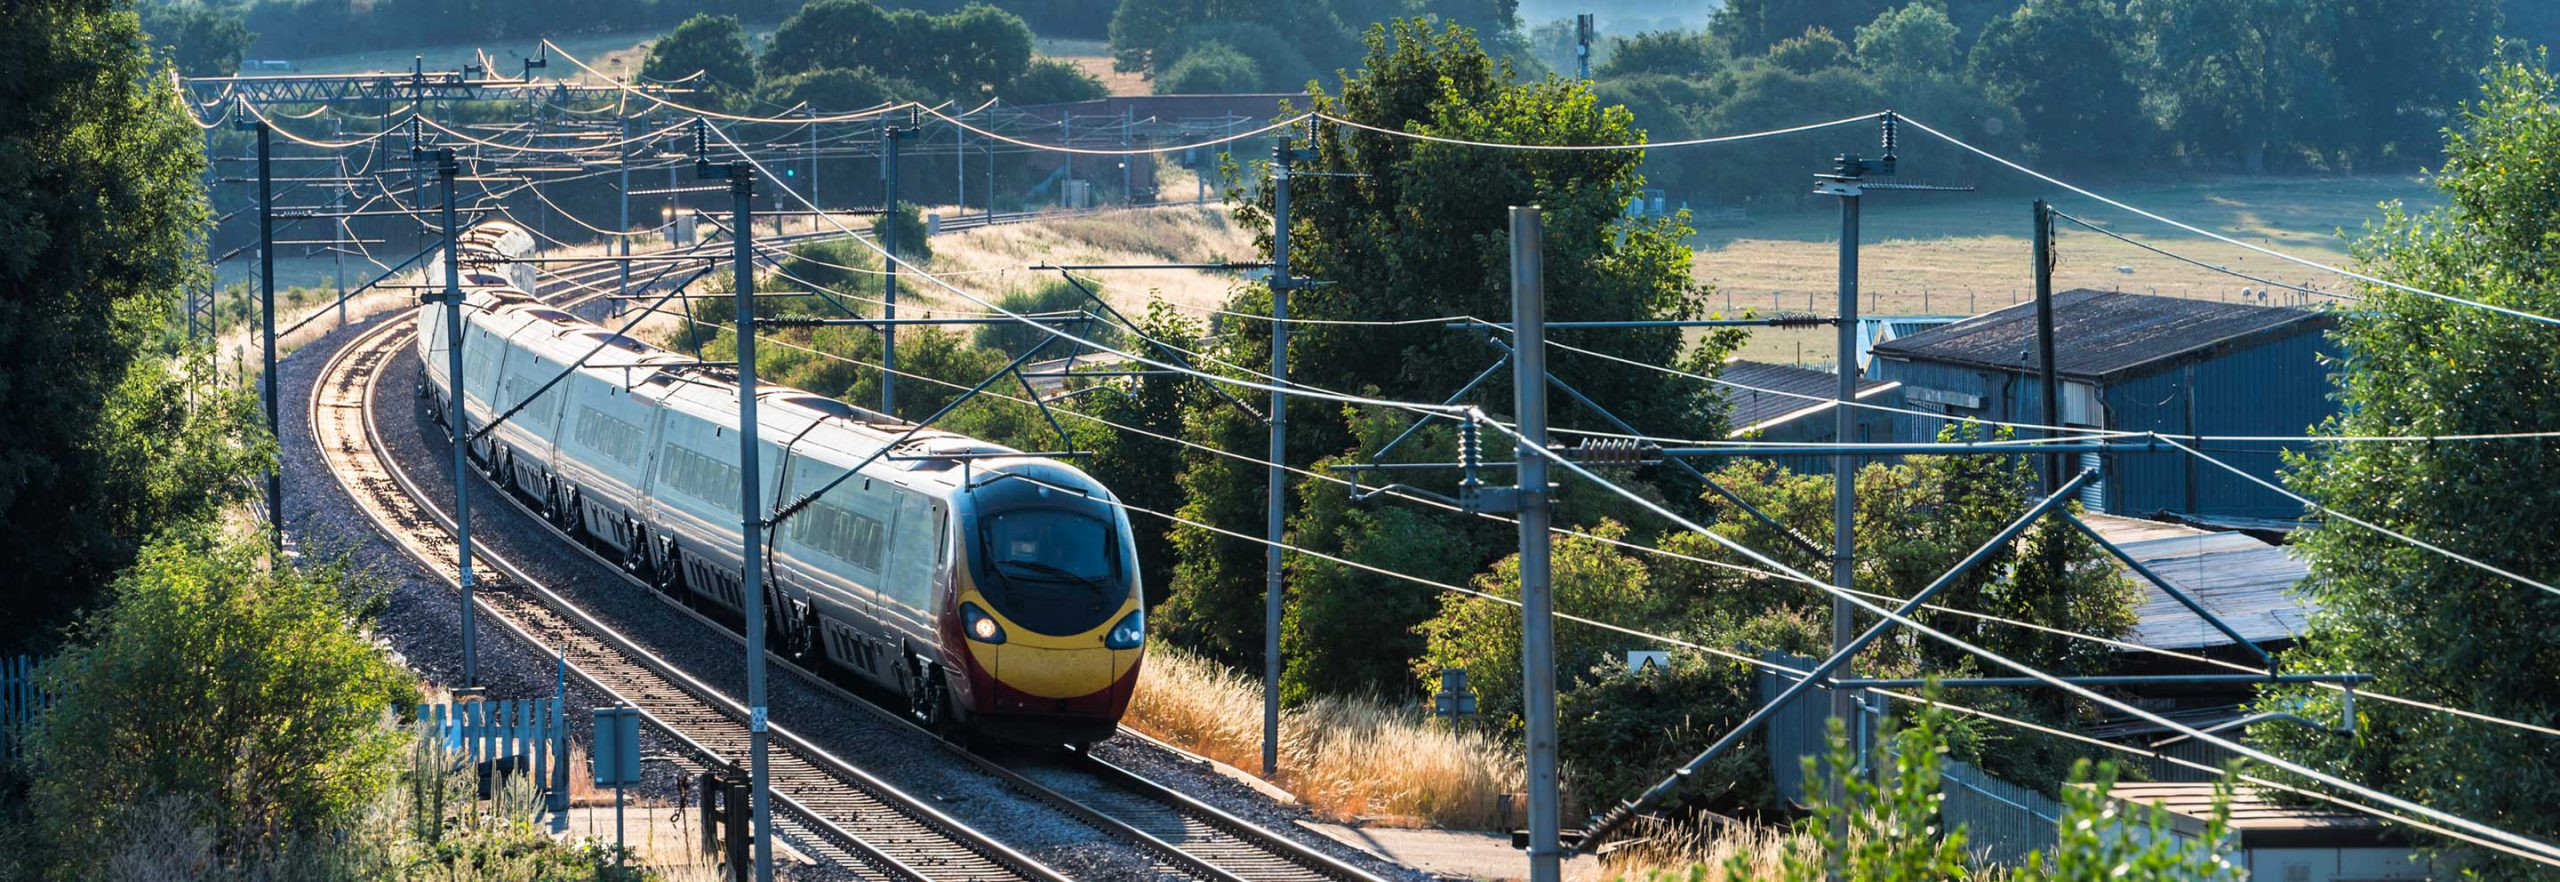 Rail adhesion